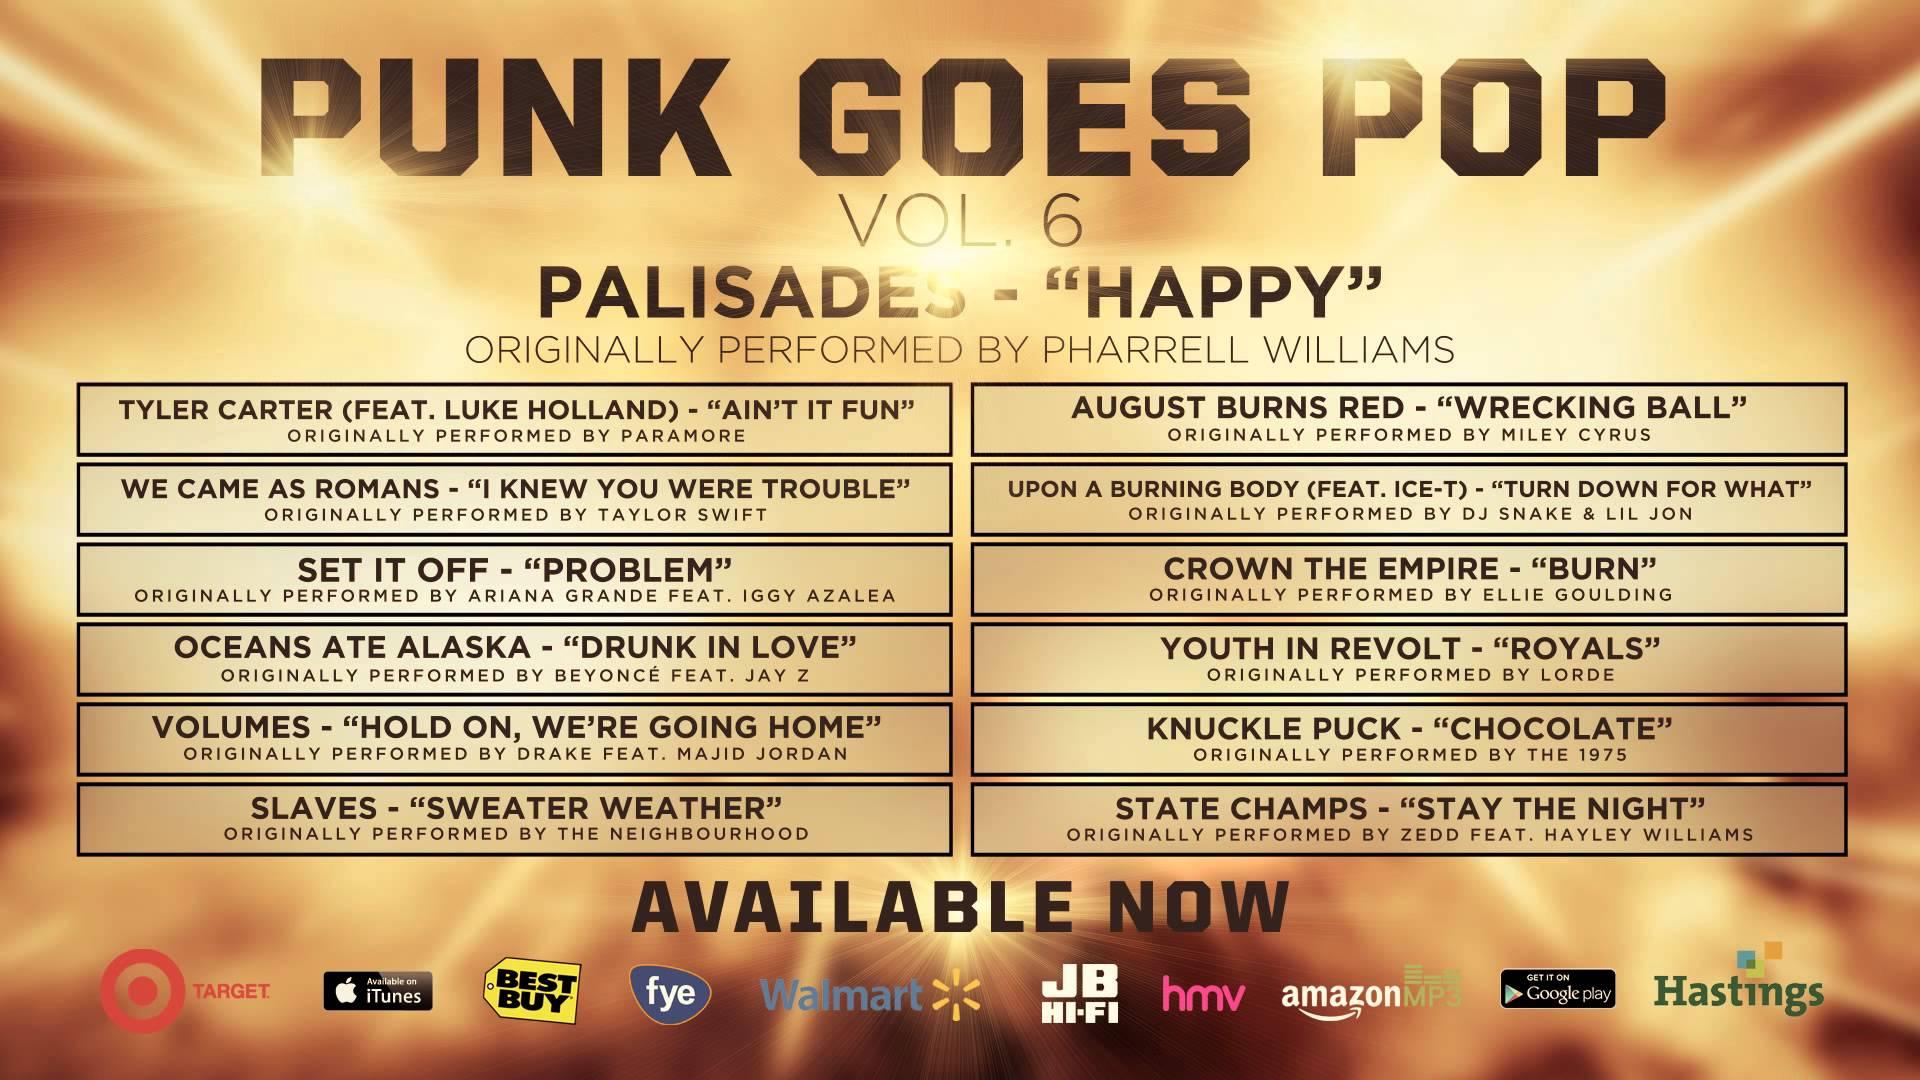 Punk Goes Pop Vol. 6 - Palisades 'Happy'